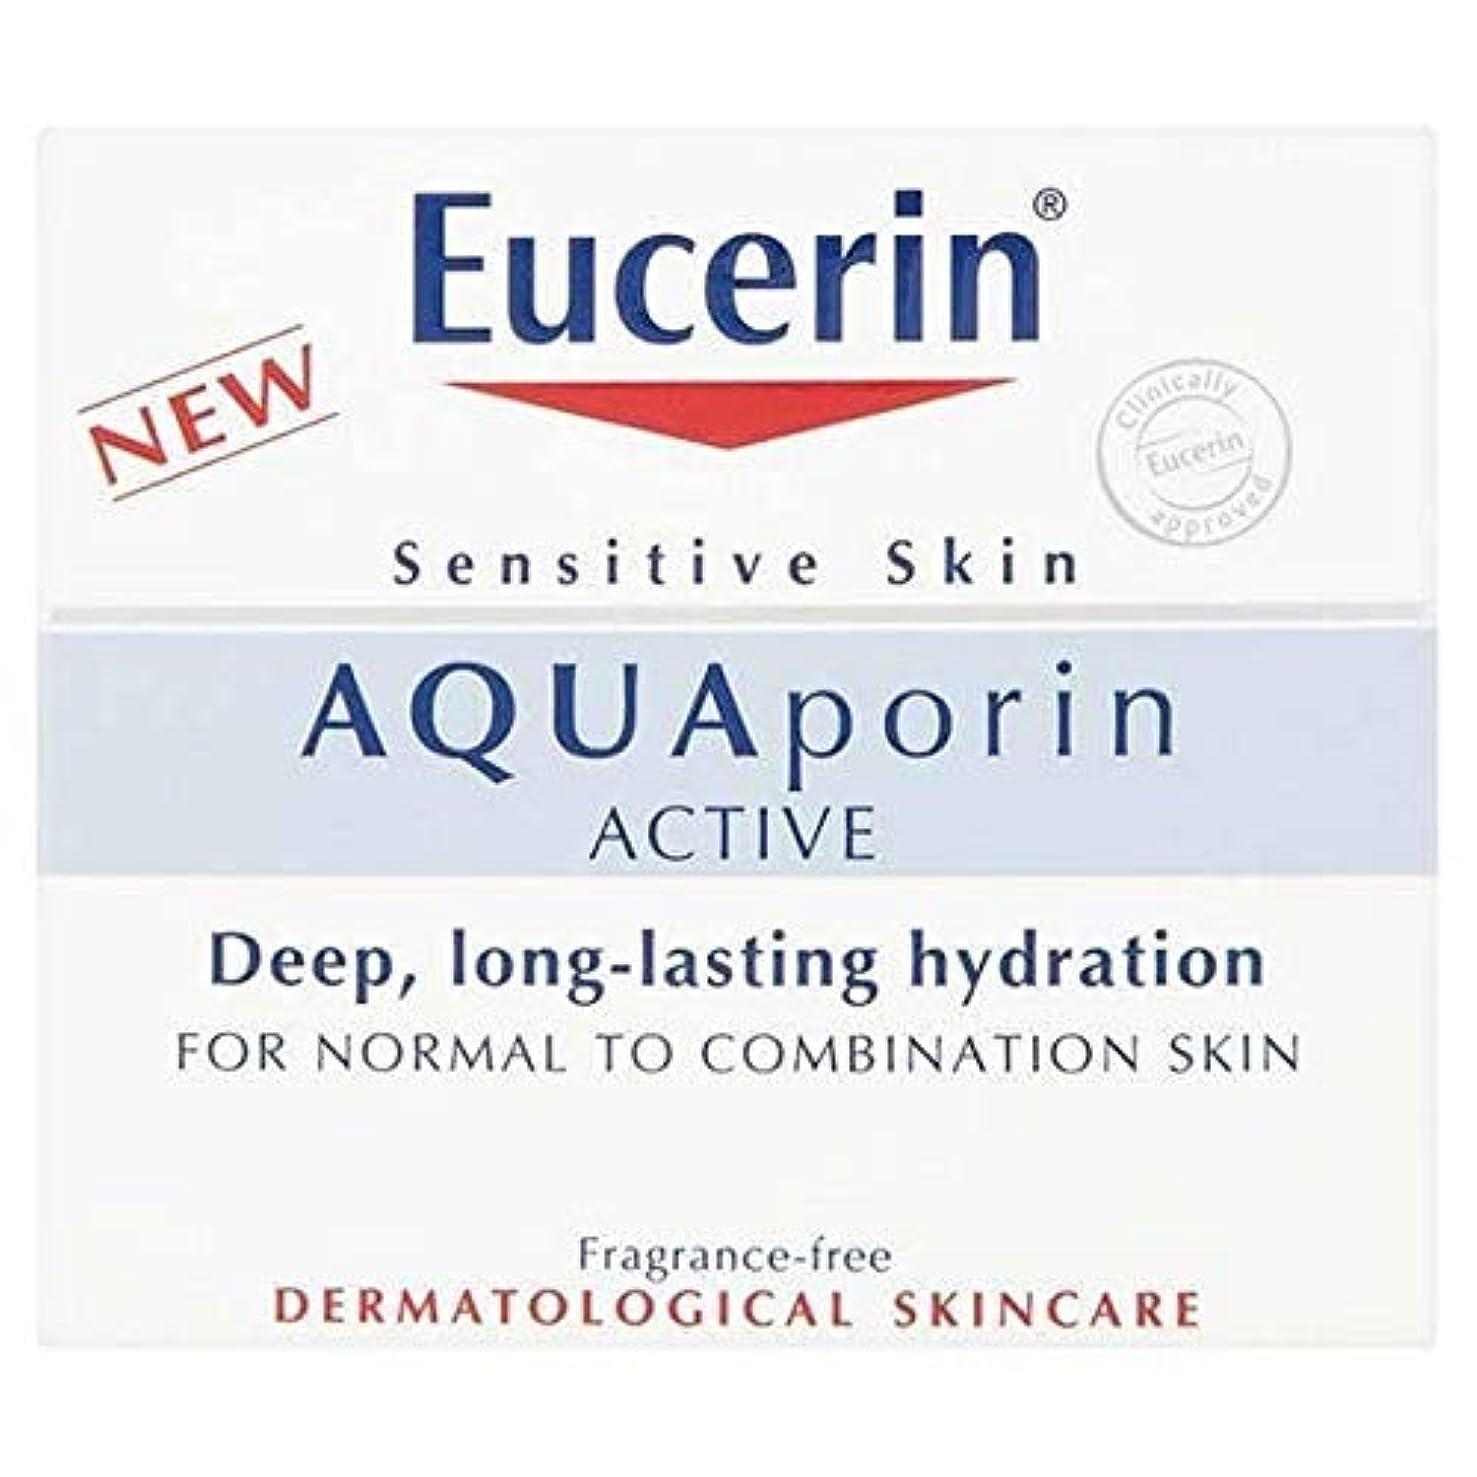 [Eucerin ] ノーマル/櫛皮膚50ミリリットルのためのユーセリンアクアポリンアクティブ水和 - Eucerin Aquaporin Active Hydration for Normal/Comb Skin 50ml...